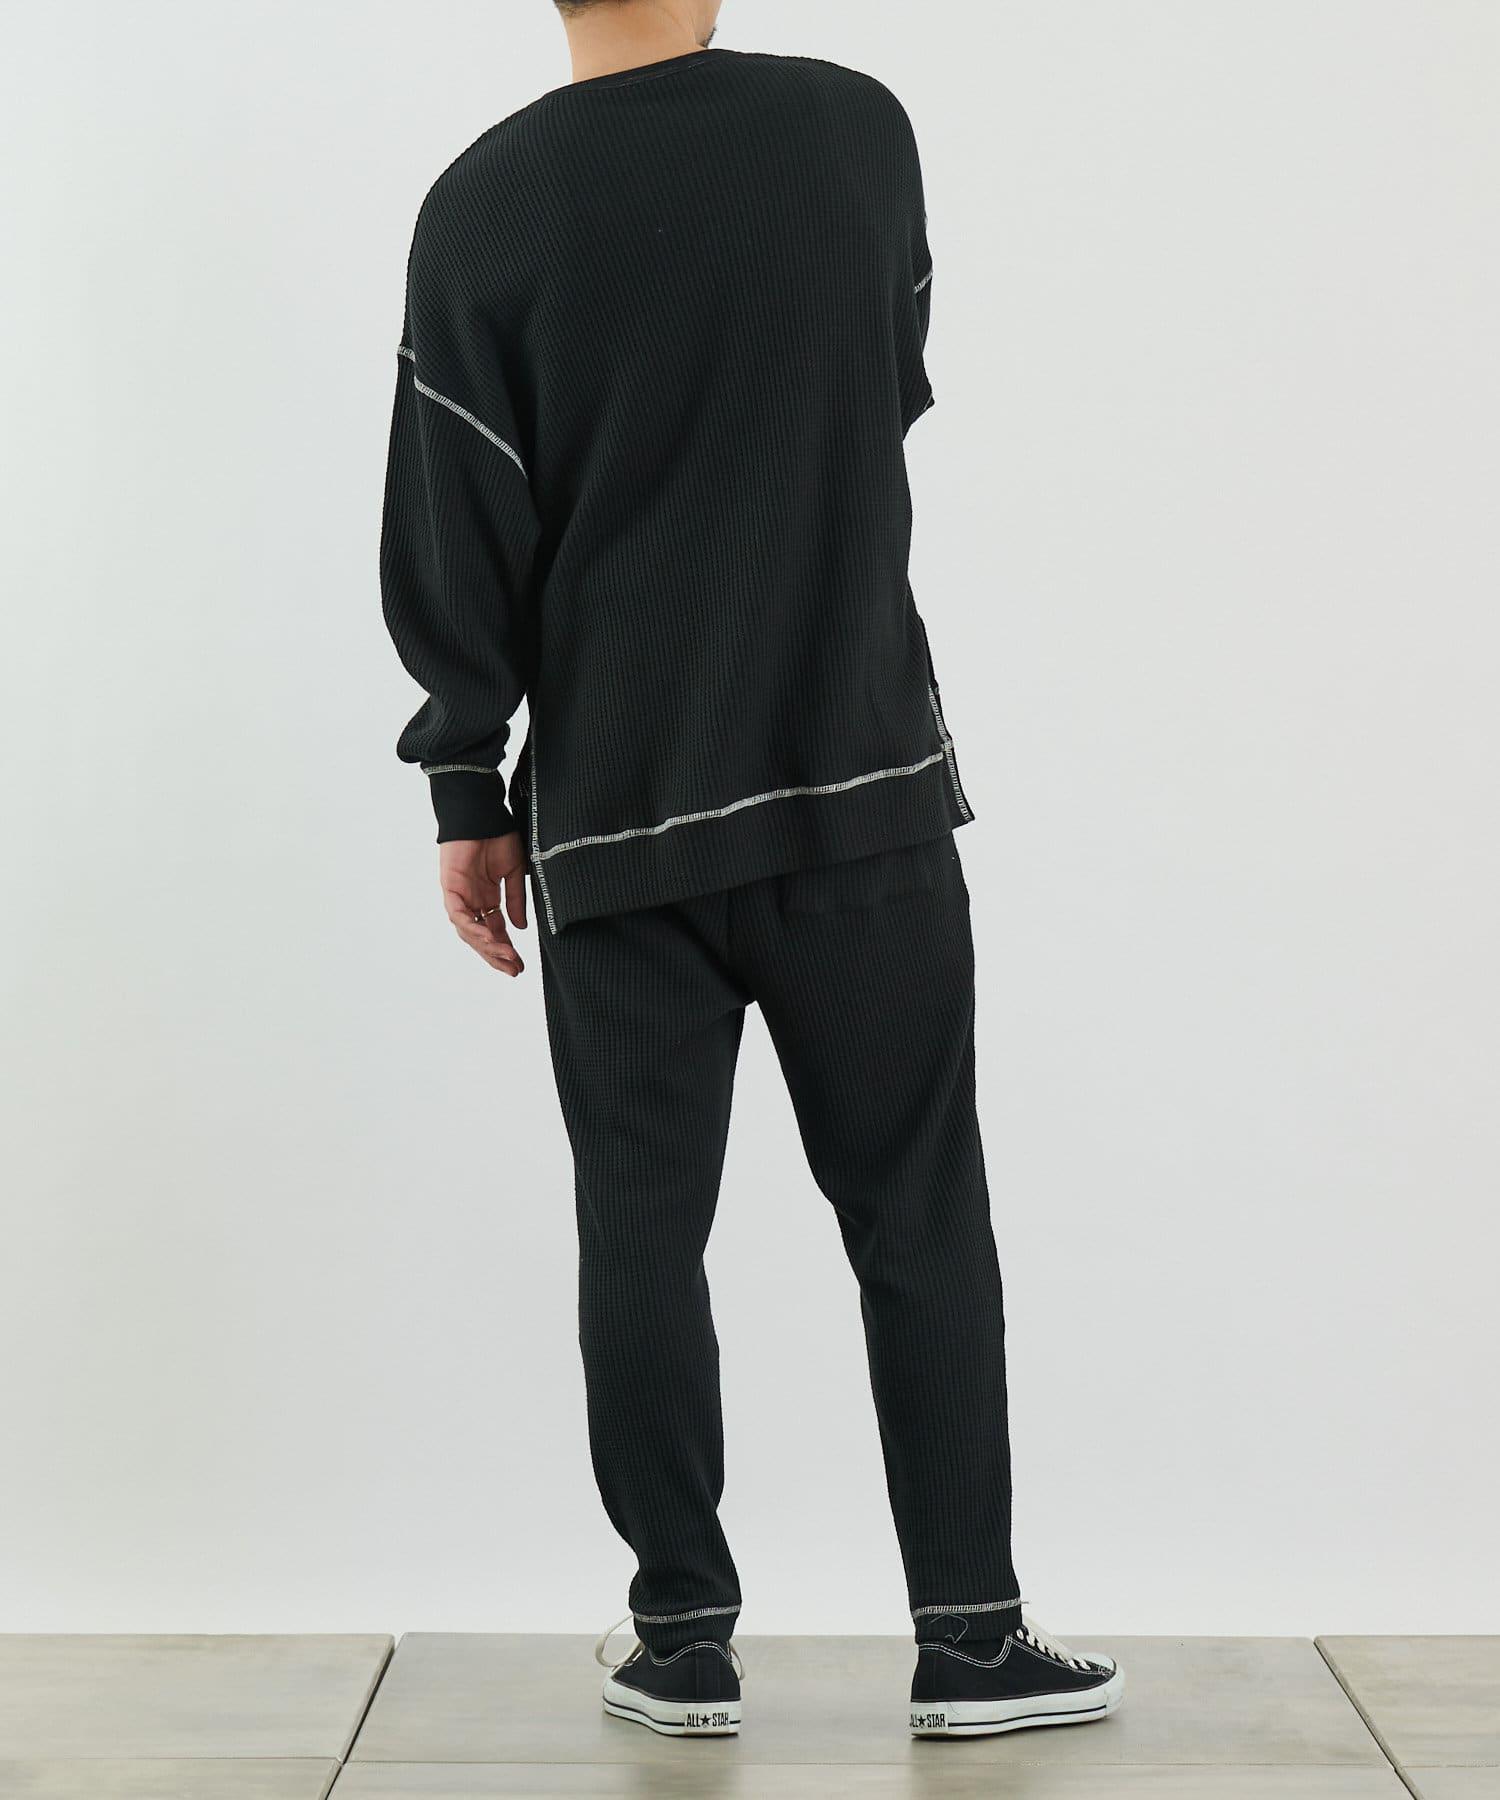 COLONY 2139(コロニー トゥーワンスリーナイン) 【MEN'S】配色ステッチワッフル前後差長袖Tシャツ/ルームウェア